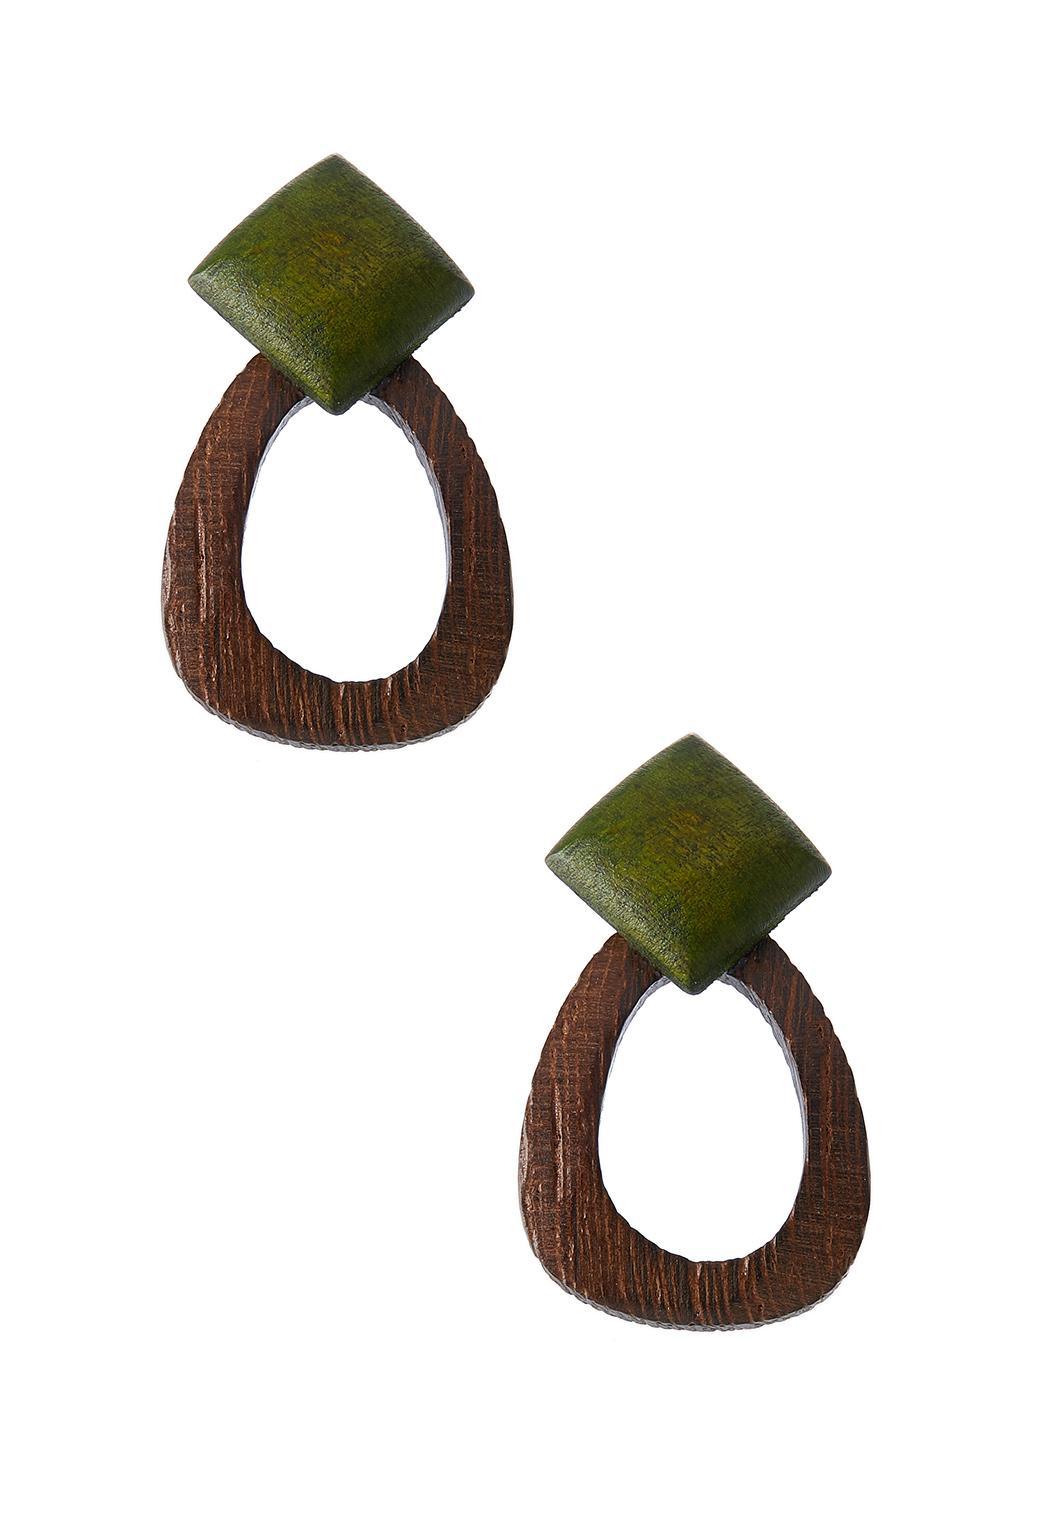 Two-Toned Geo Wood Earrings